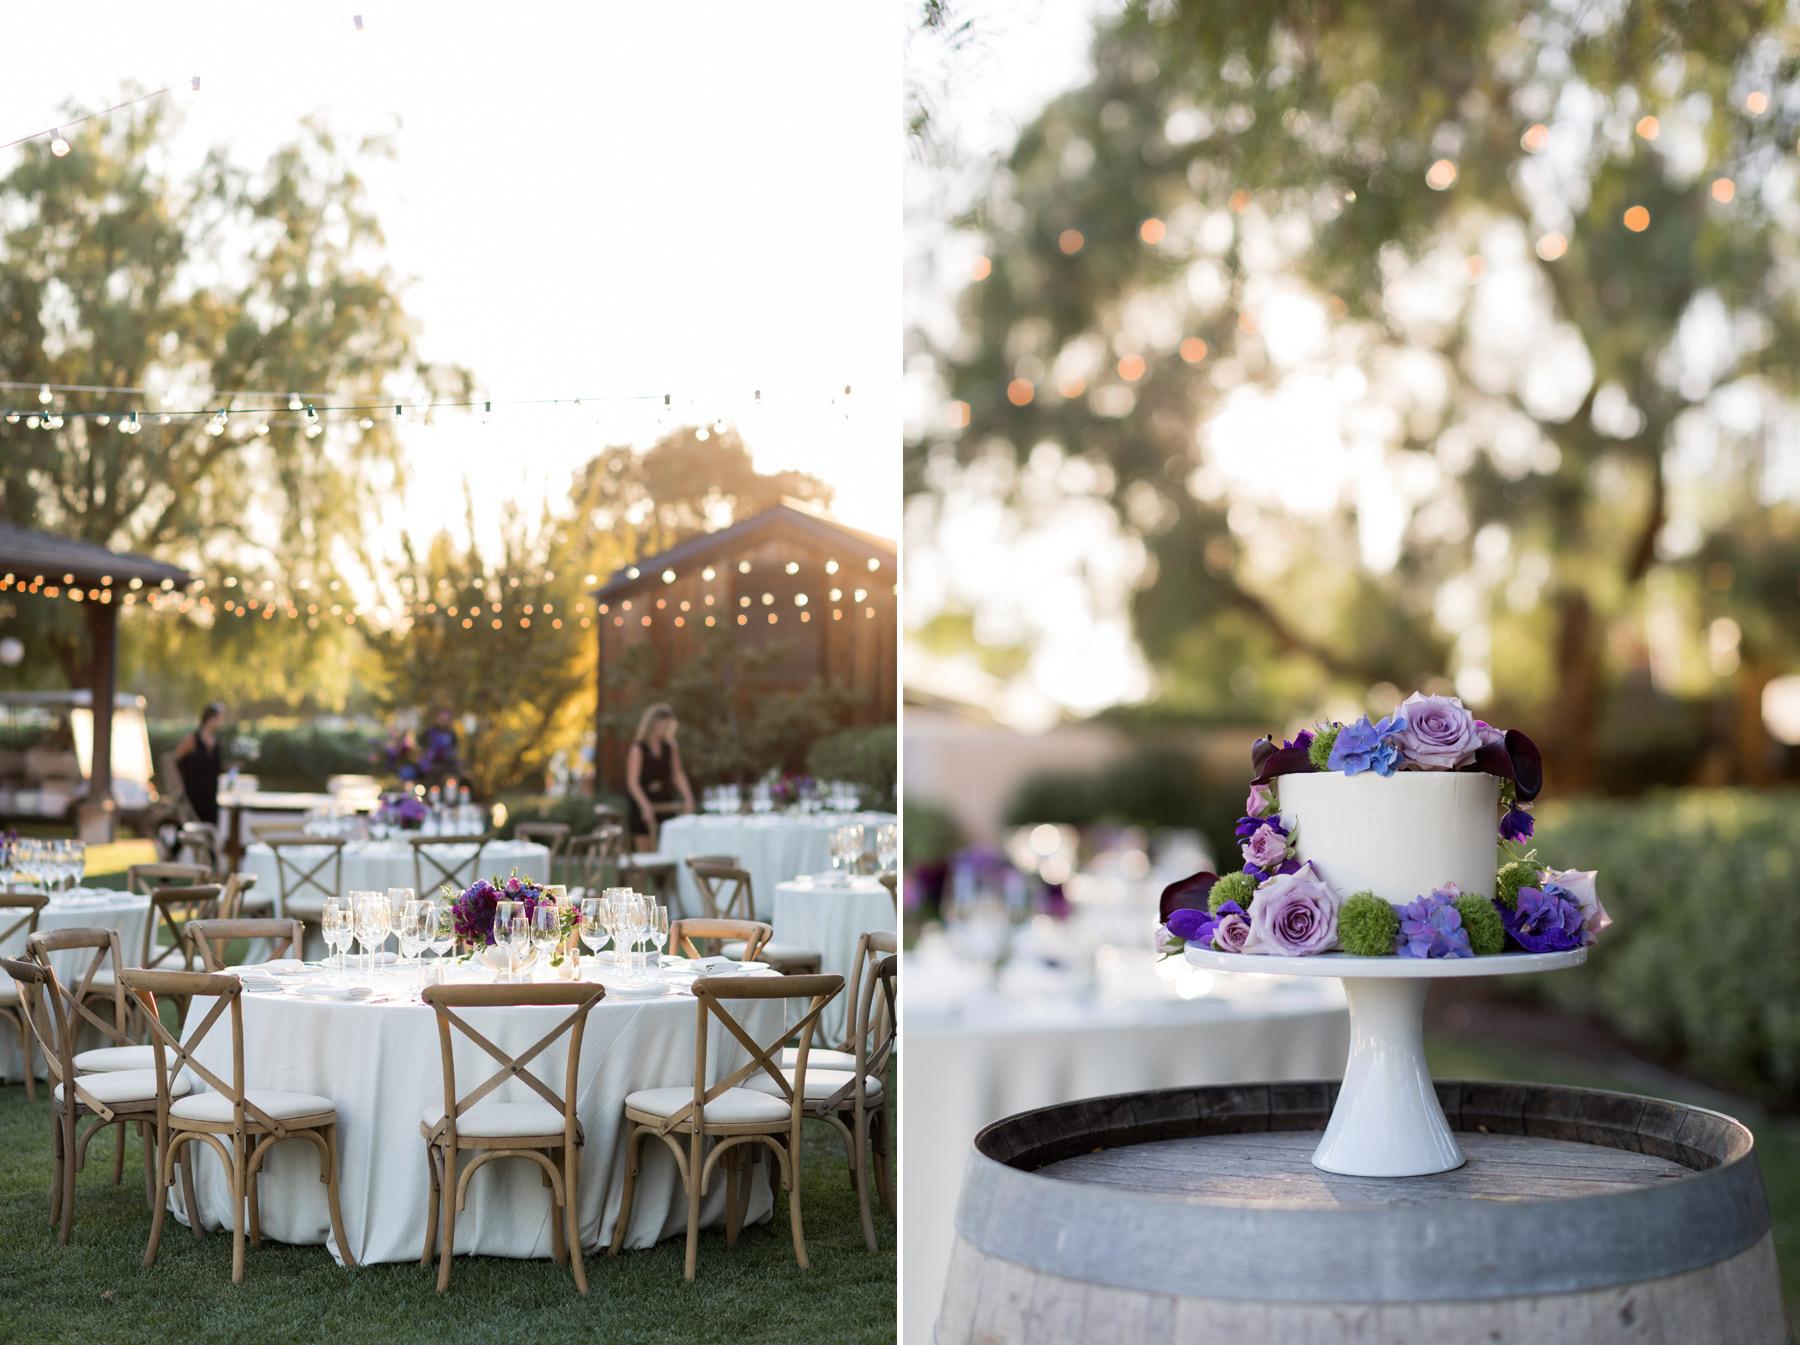 wedding cake roblar winery wedding